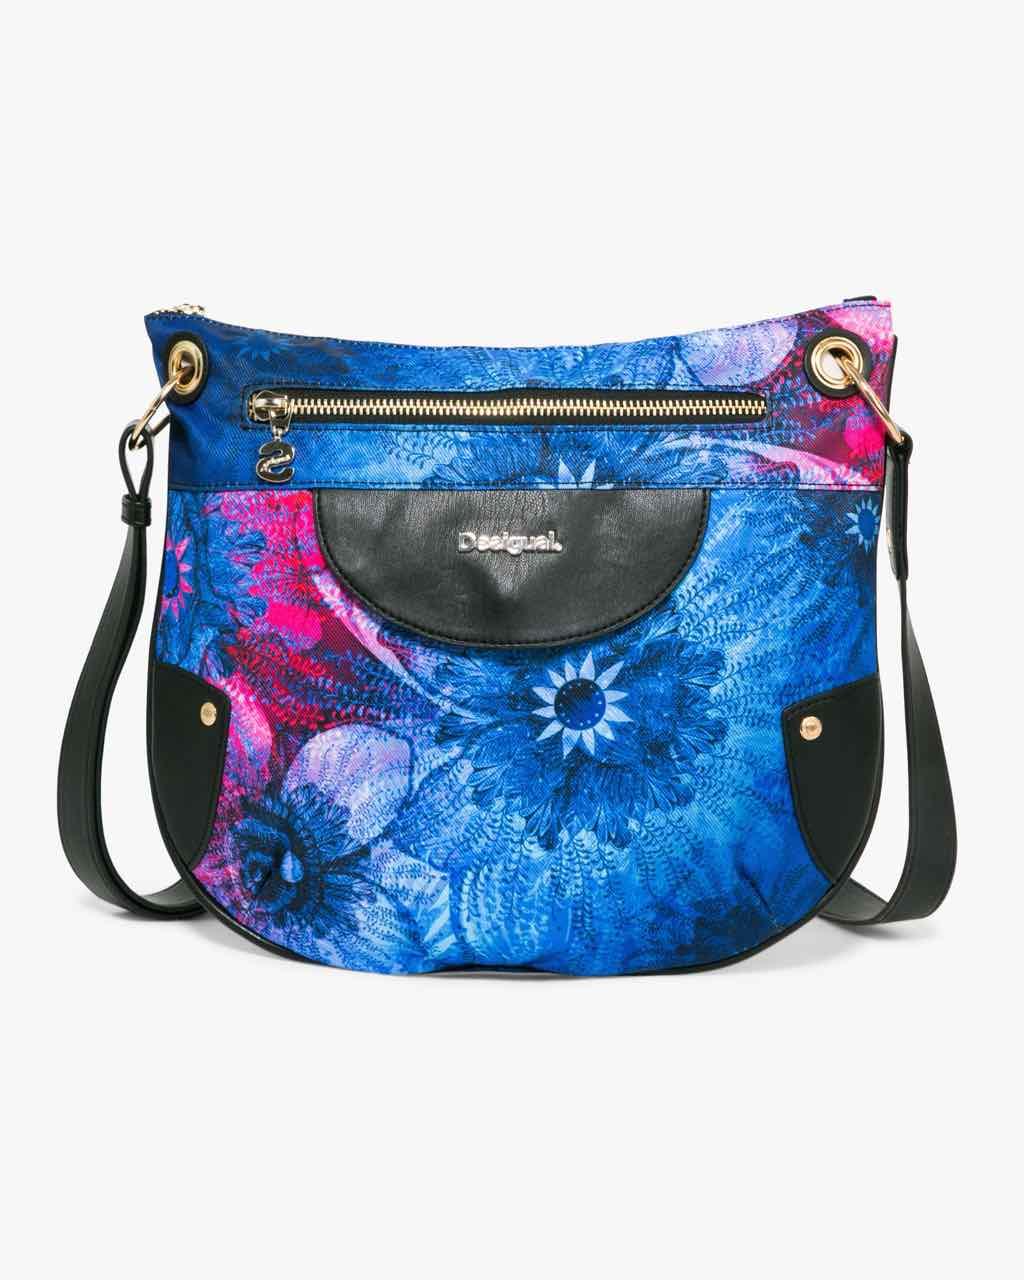 17WAXFYA_5000 Desigual Bag Brooklyn Carlin Buy Online